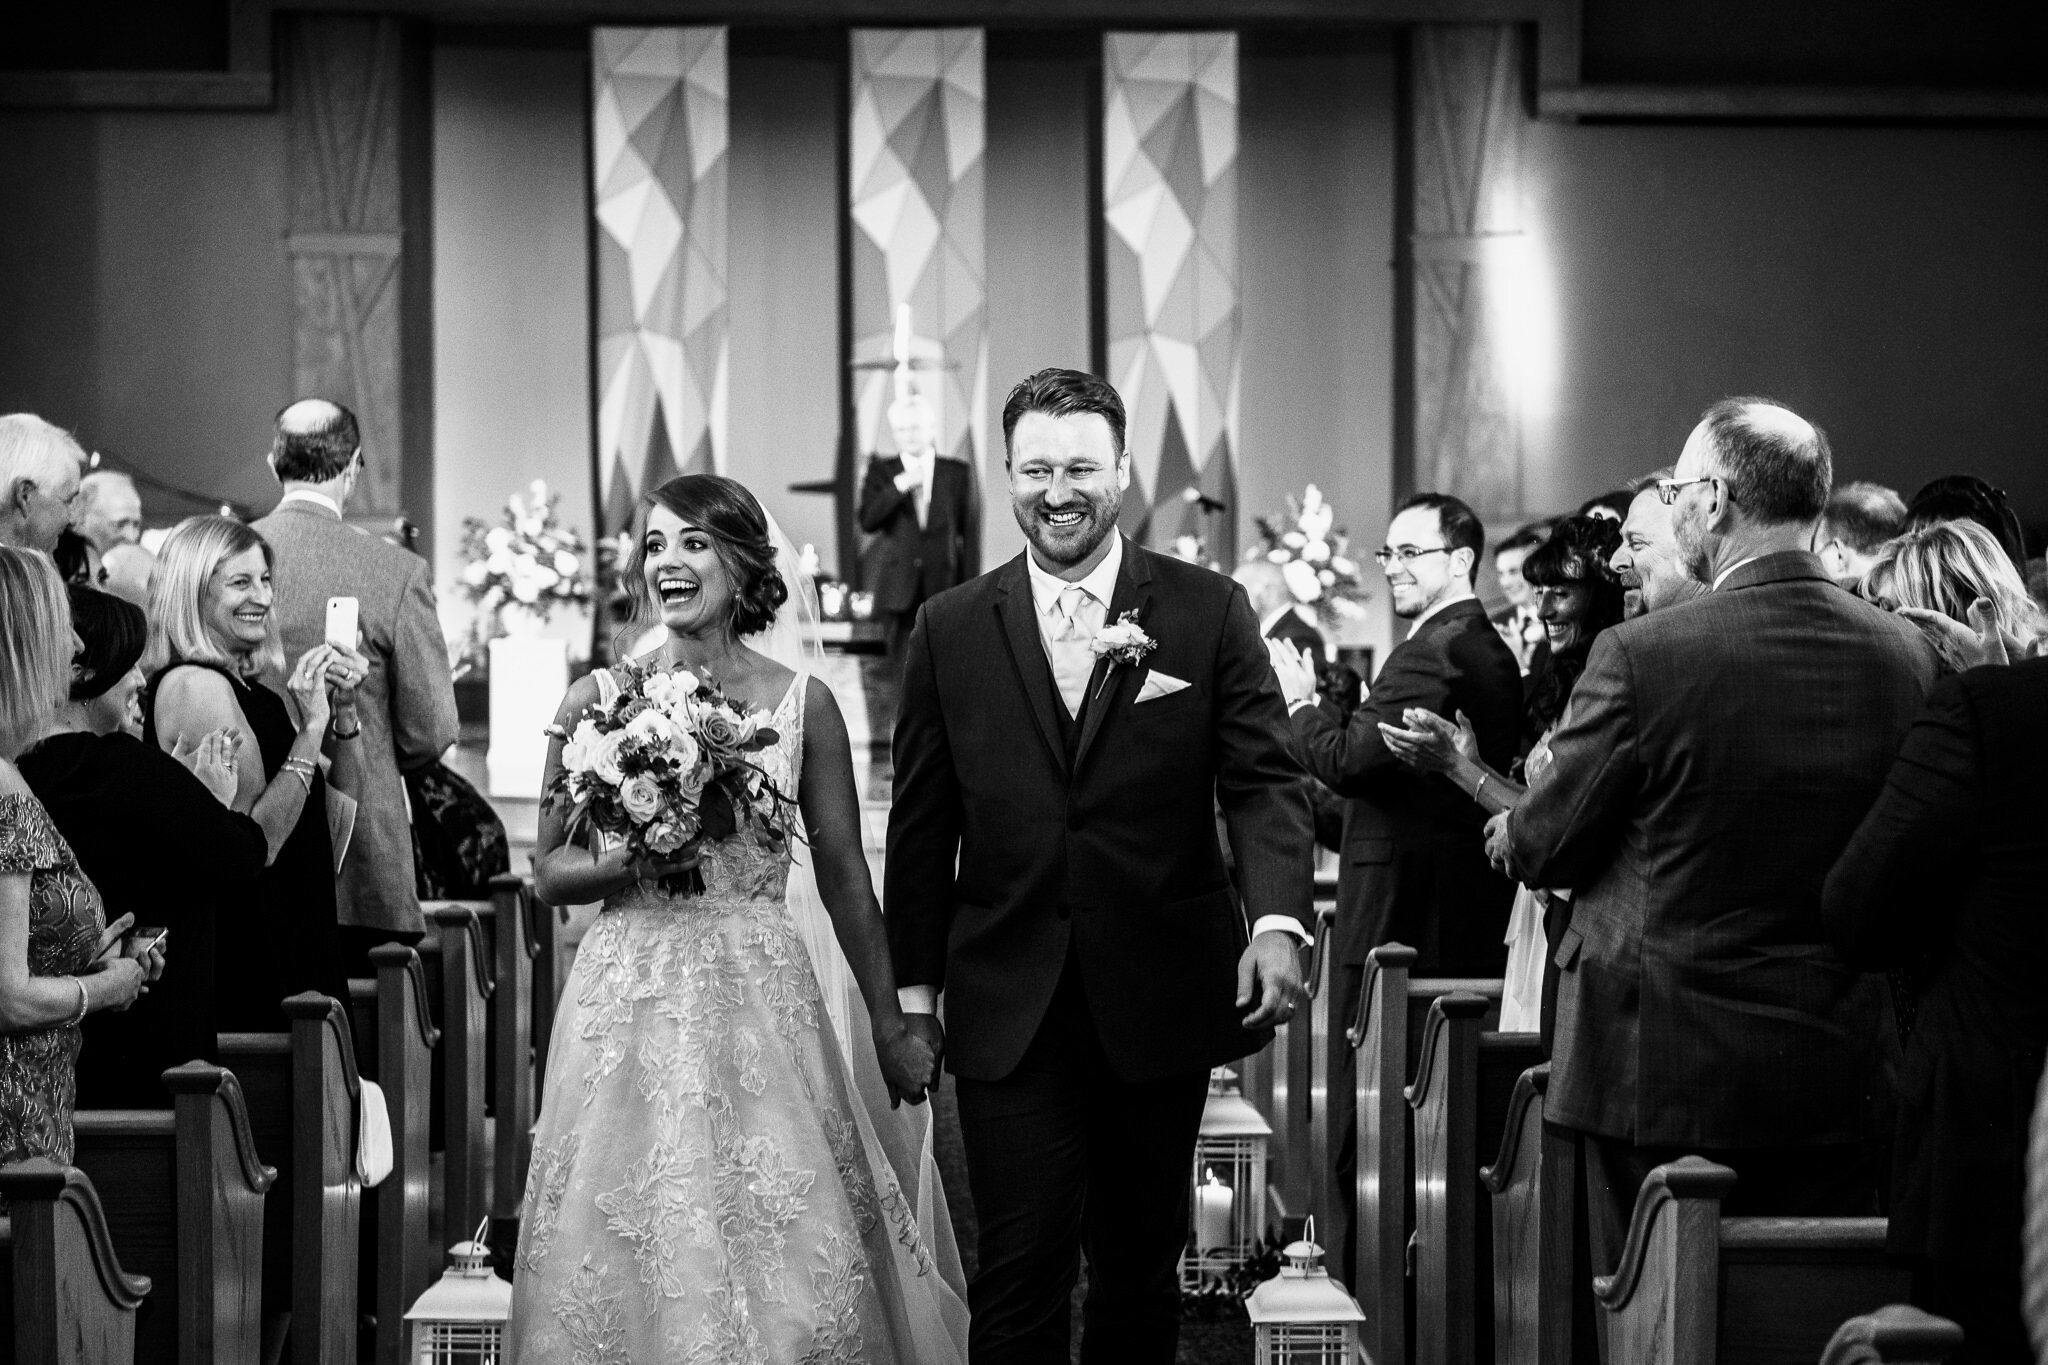 Coyle-Forsgate-Country-Club-Wedding-Photographer-14.JPG